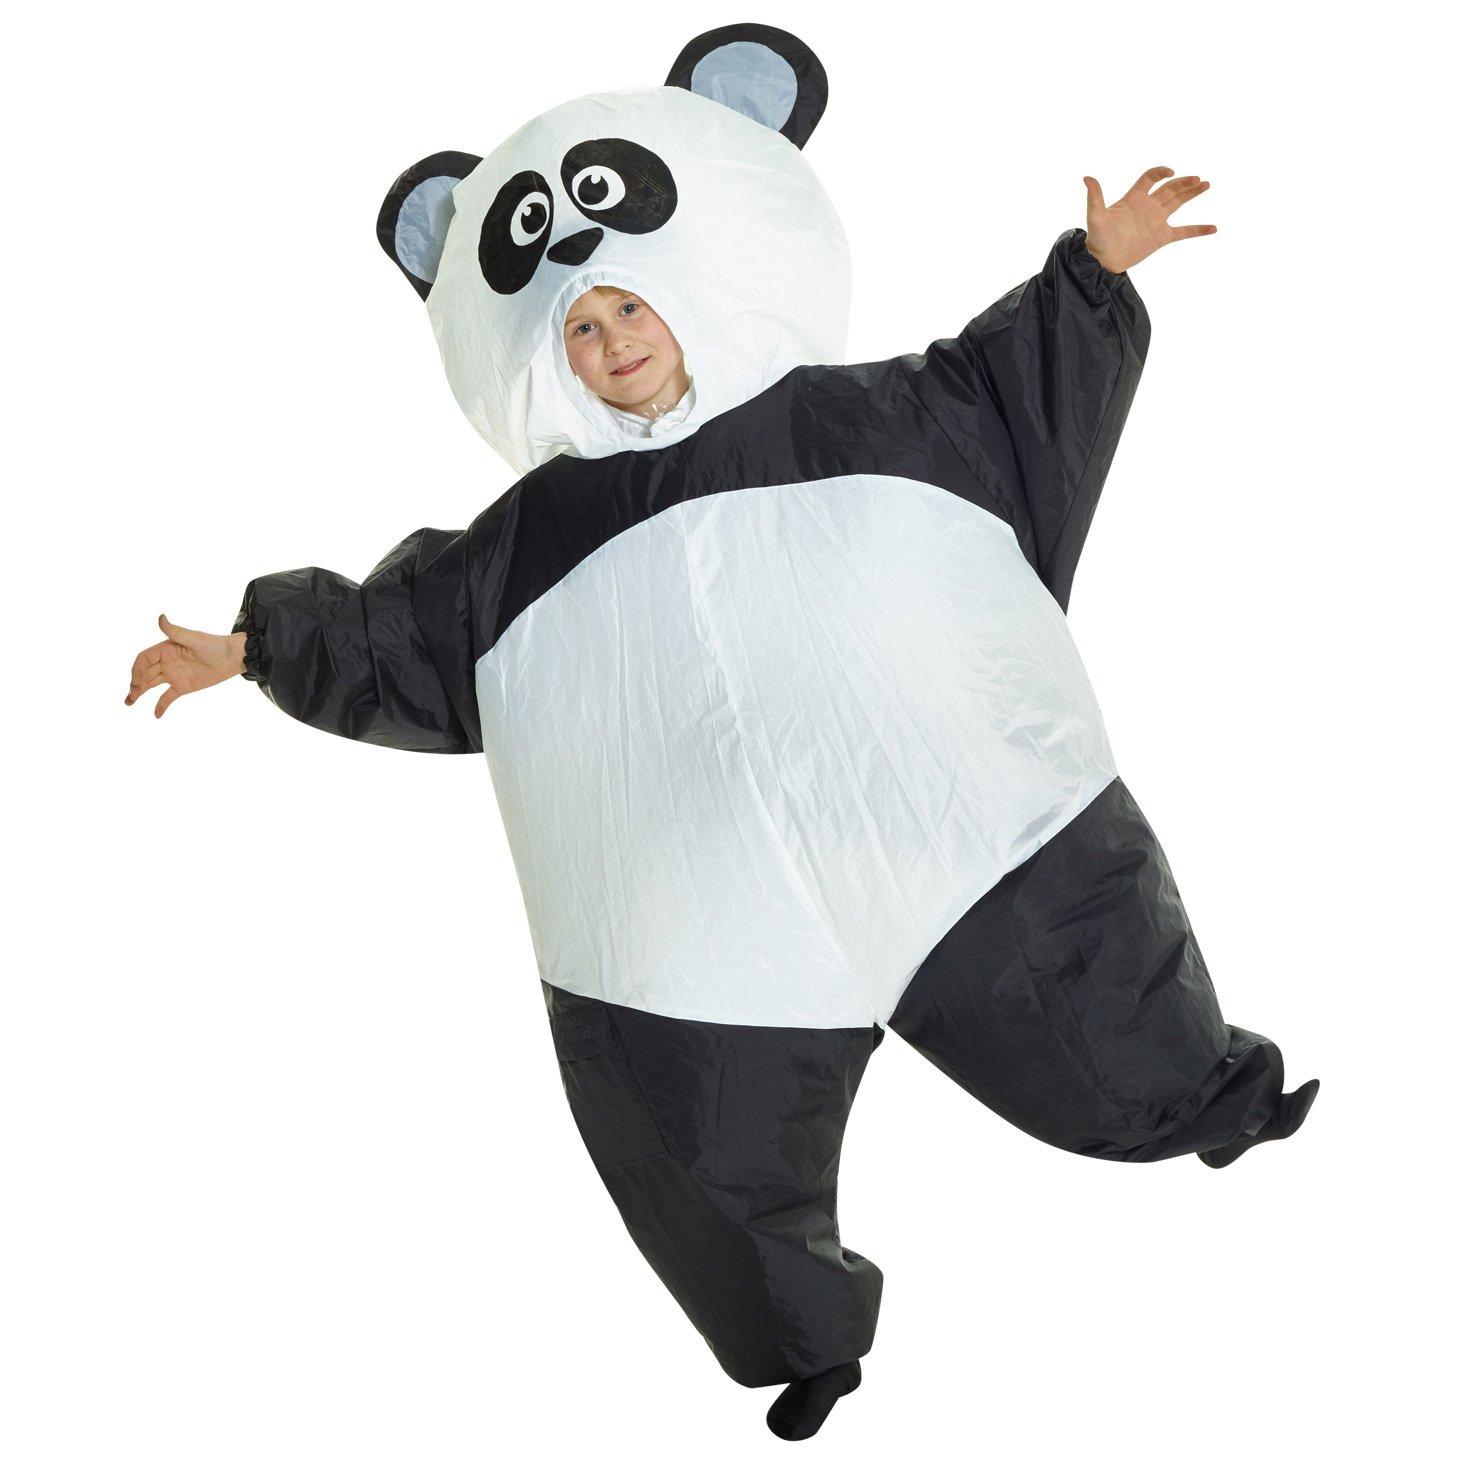 Amazon.com: Morph Panda - Disfraz inflable: Toys & Games